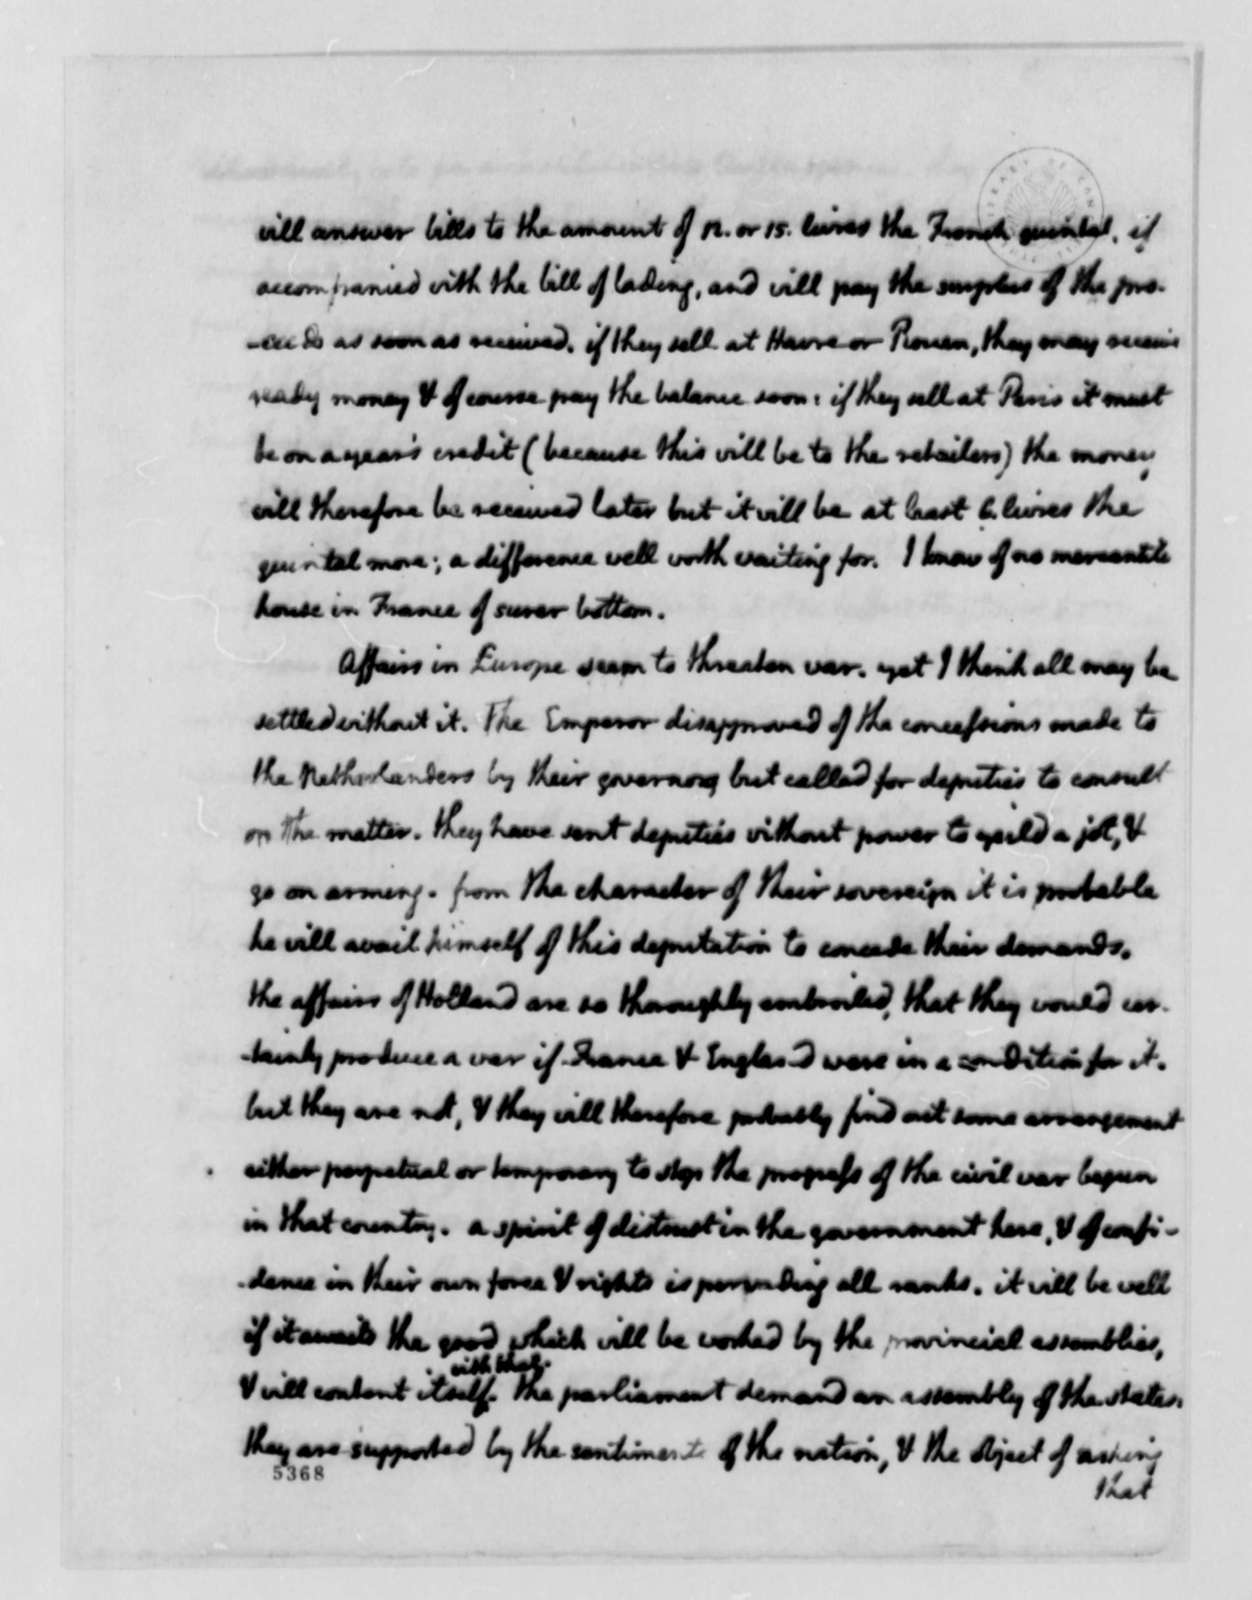 Thomas Jefferson to Ralph Izard, August 1, 1787